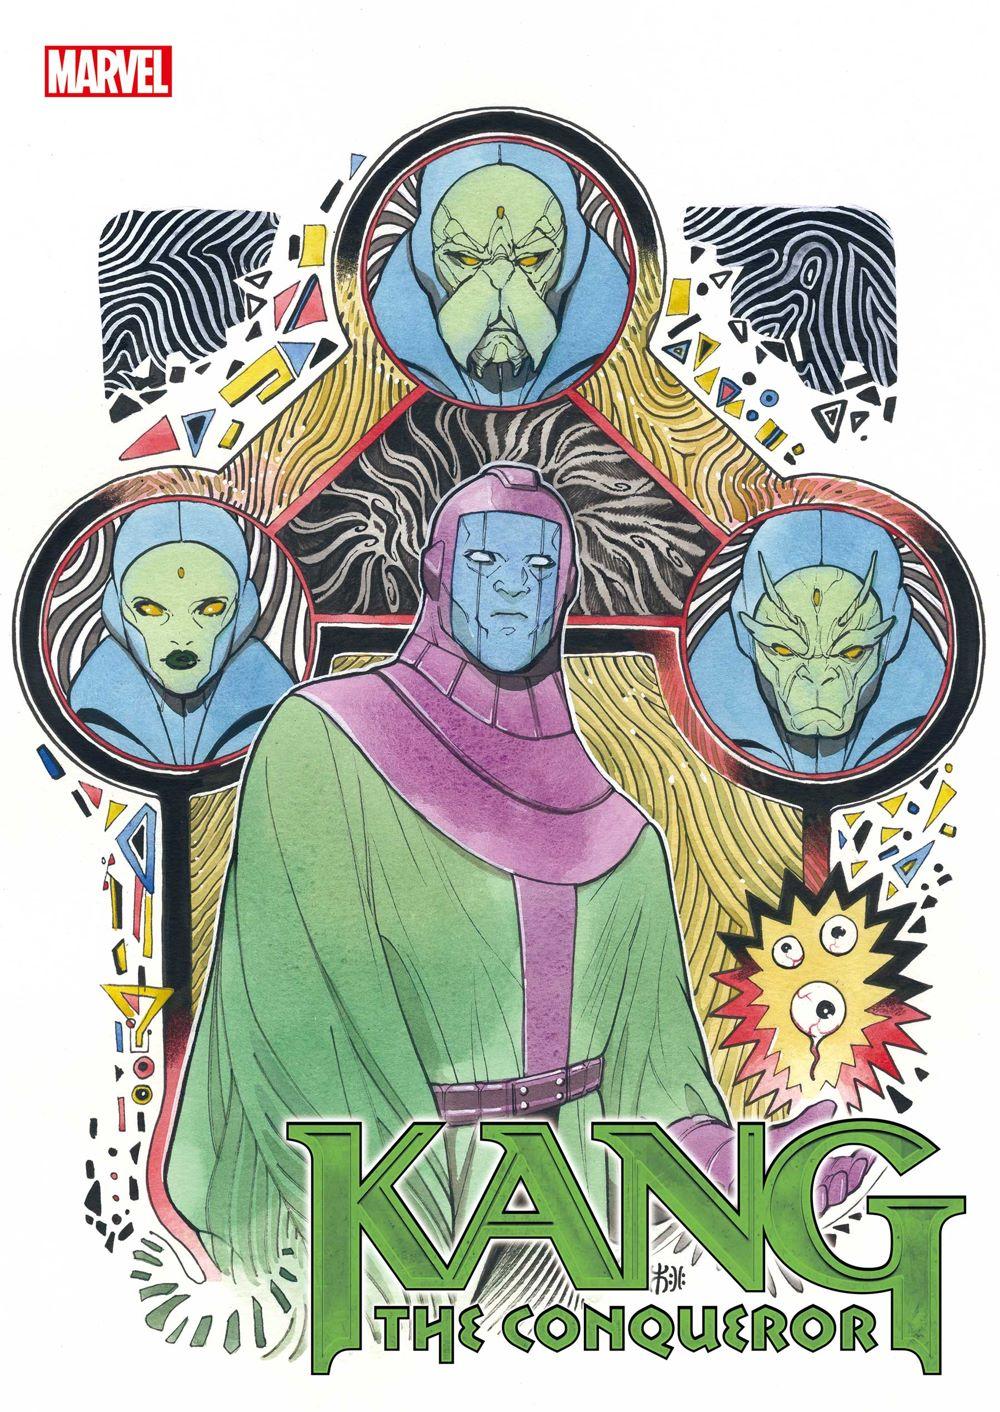 KANGCONQUEROR2021001_Momoko Marvel Comics August 2021 Solicitations